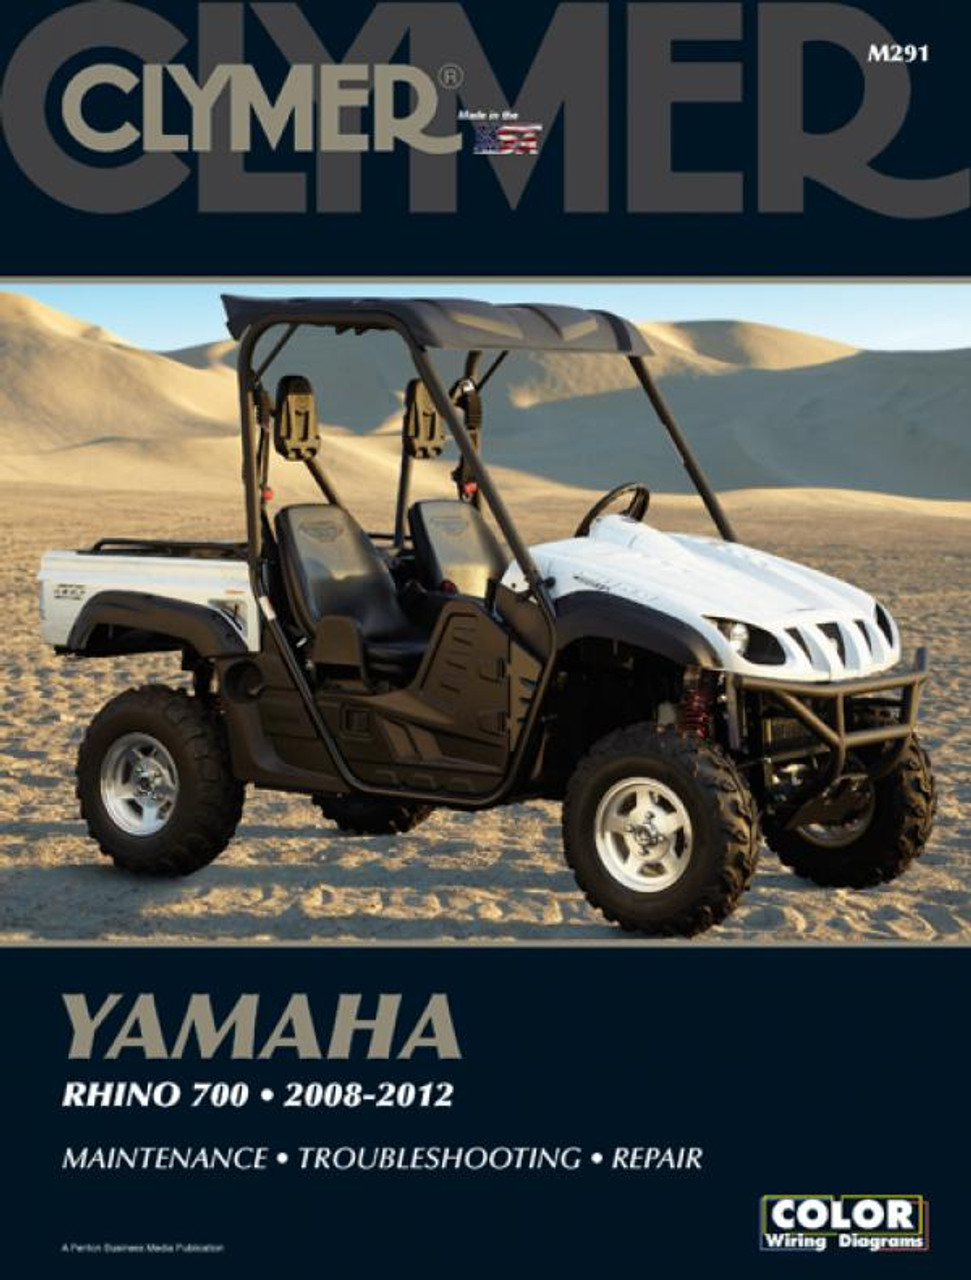 medium resolution of yamaha rhino 700 atvs 2008 2012 clymer workshop manual yamaha rhino 700 vacuum diagram